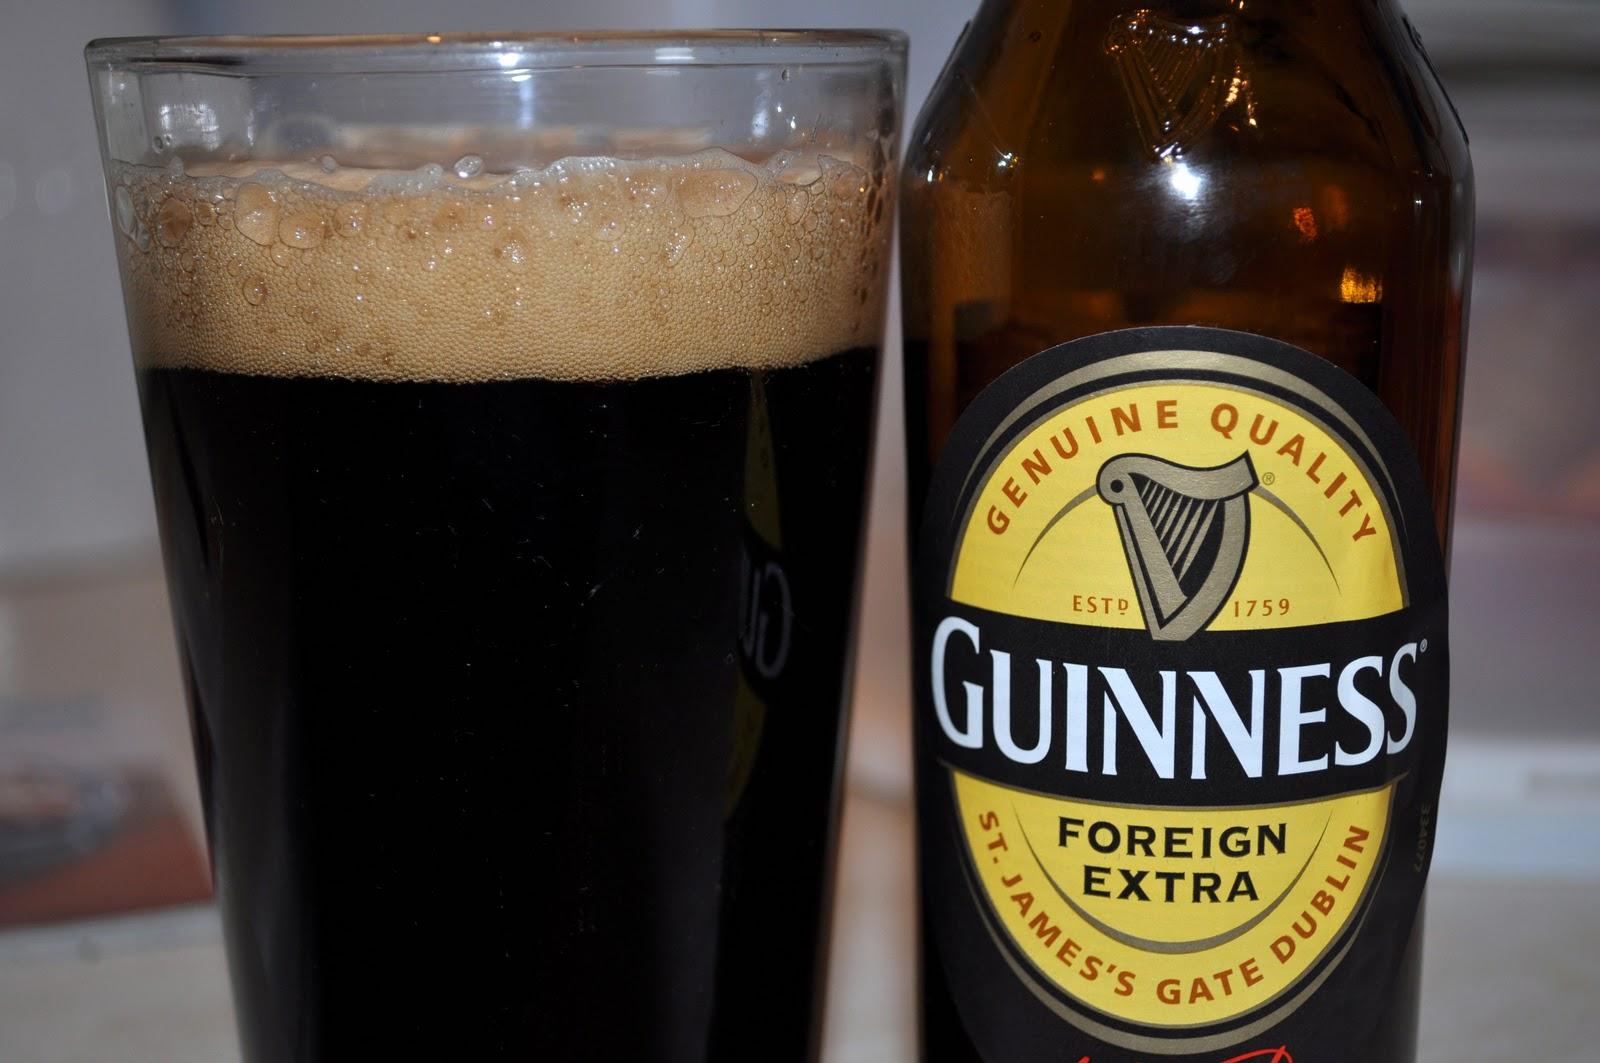 пиво гиннес фото собиралась начале октября